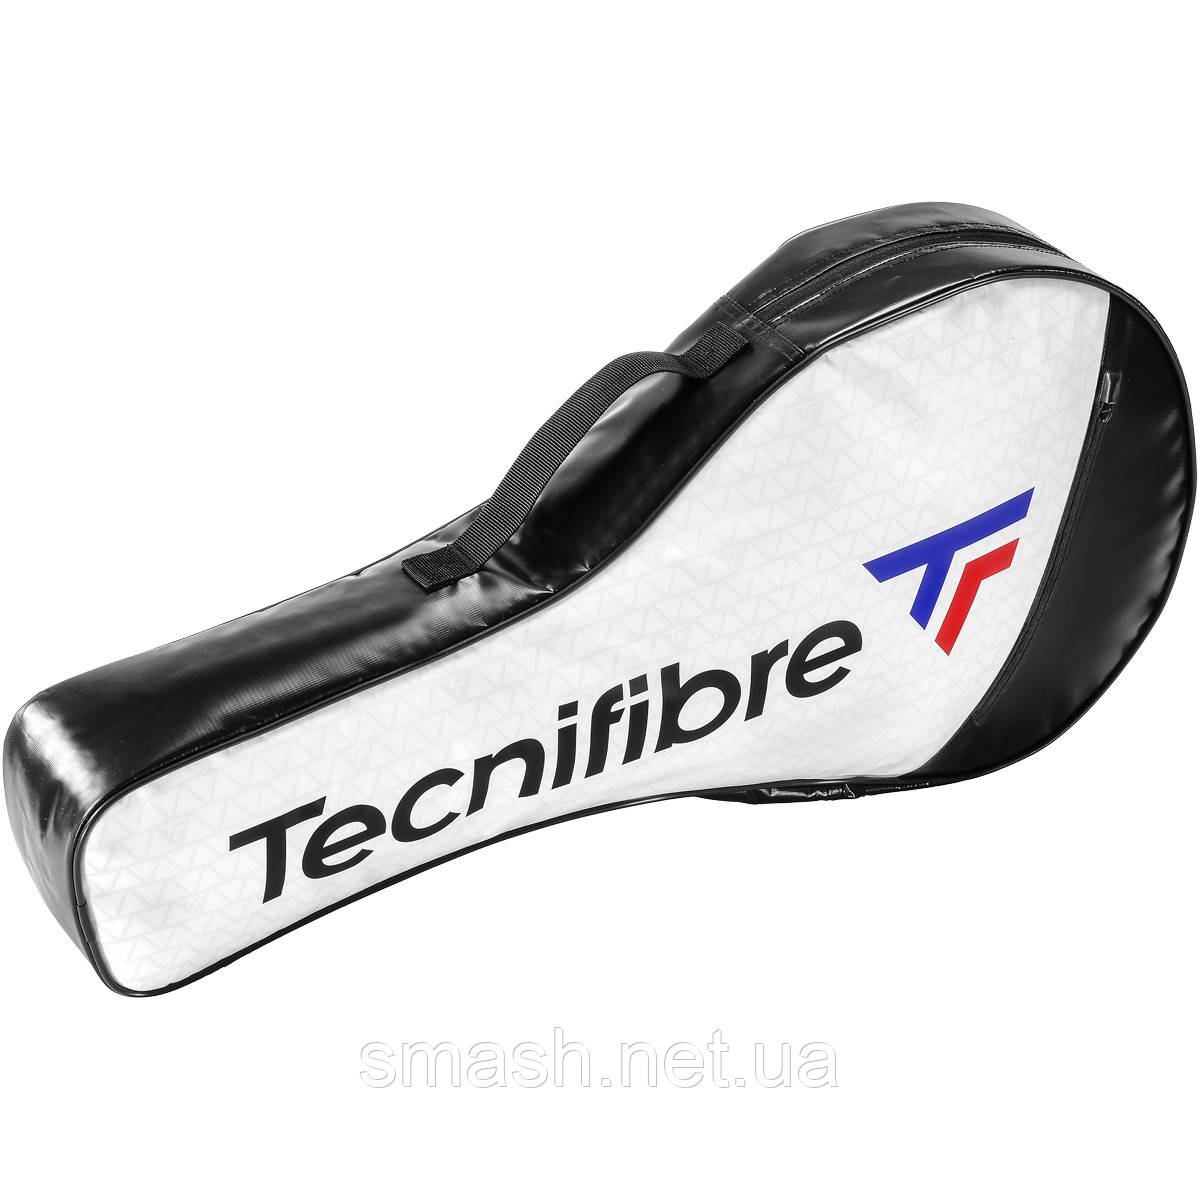 Чехол для теннисных ракеток Tecnifibre Tour RS Endurance 4R 2021